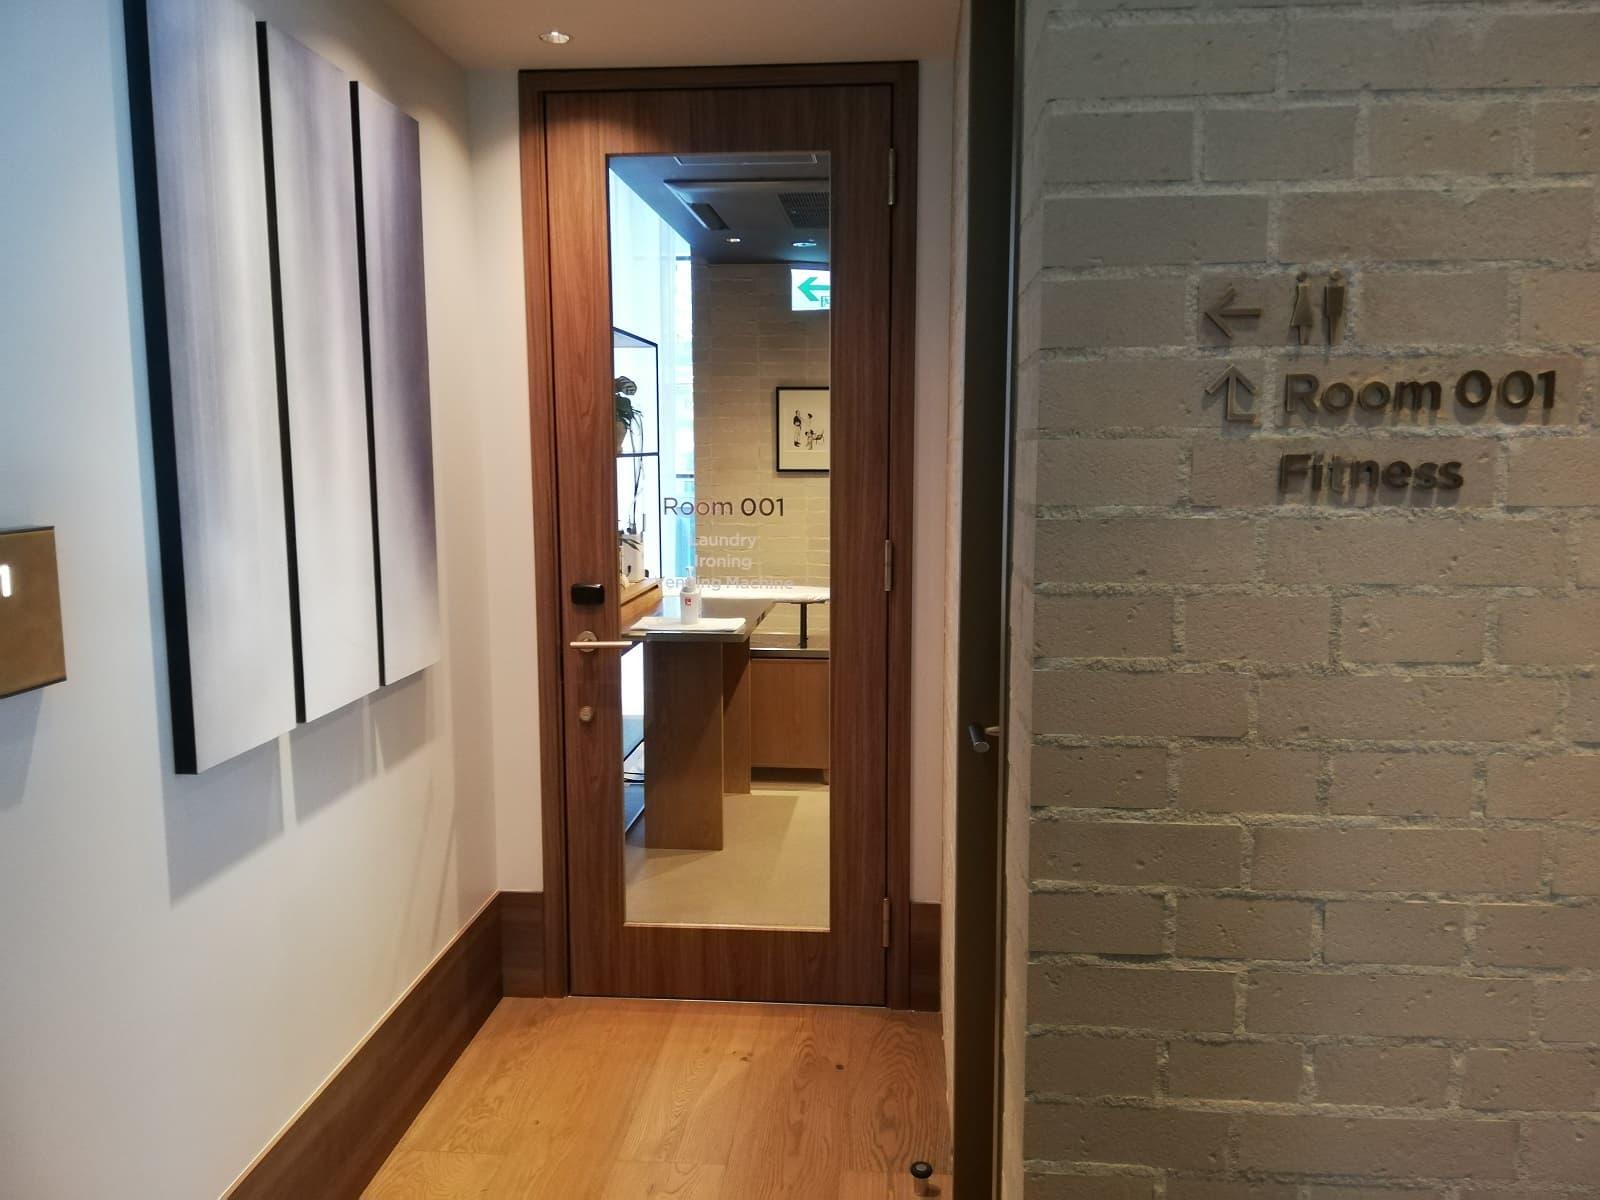 「Room 001」の入口